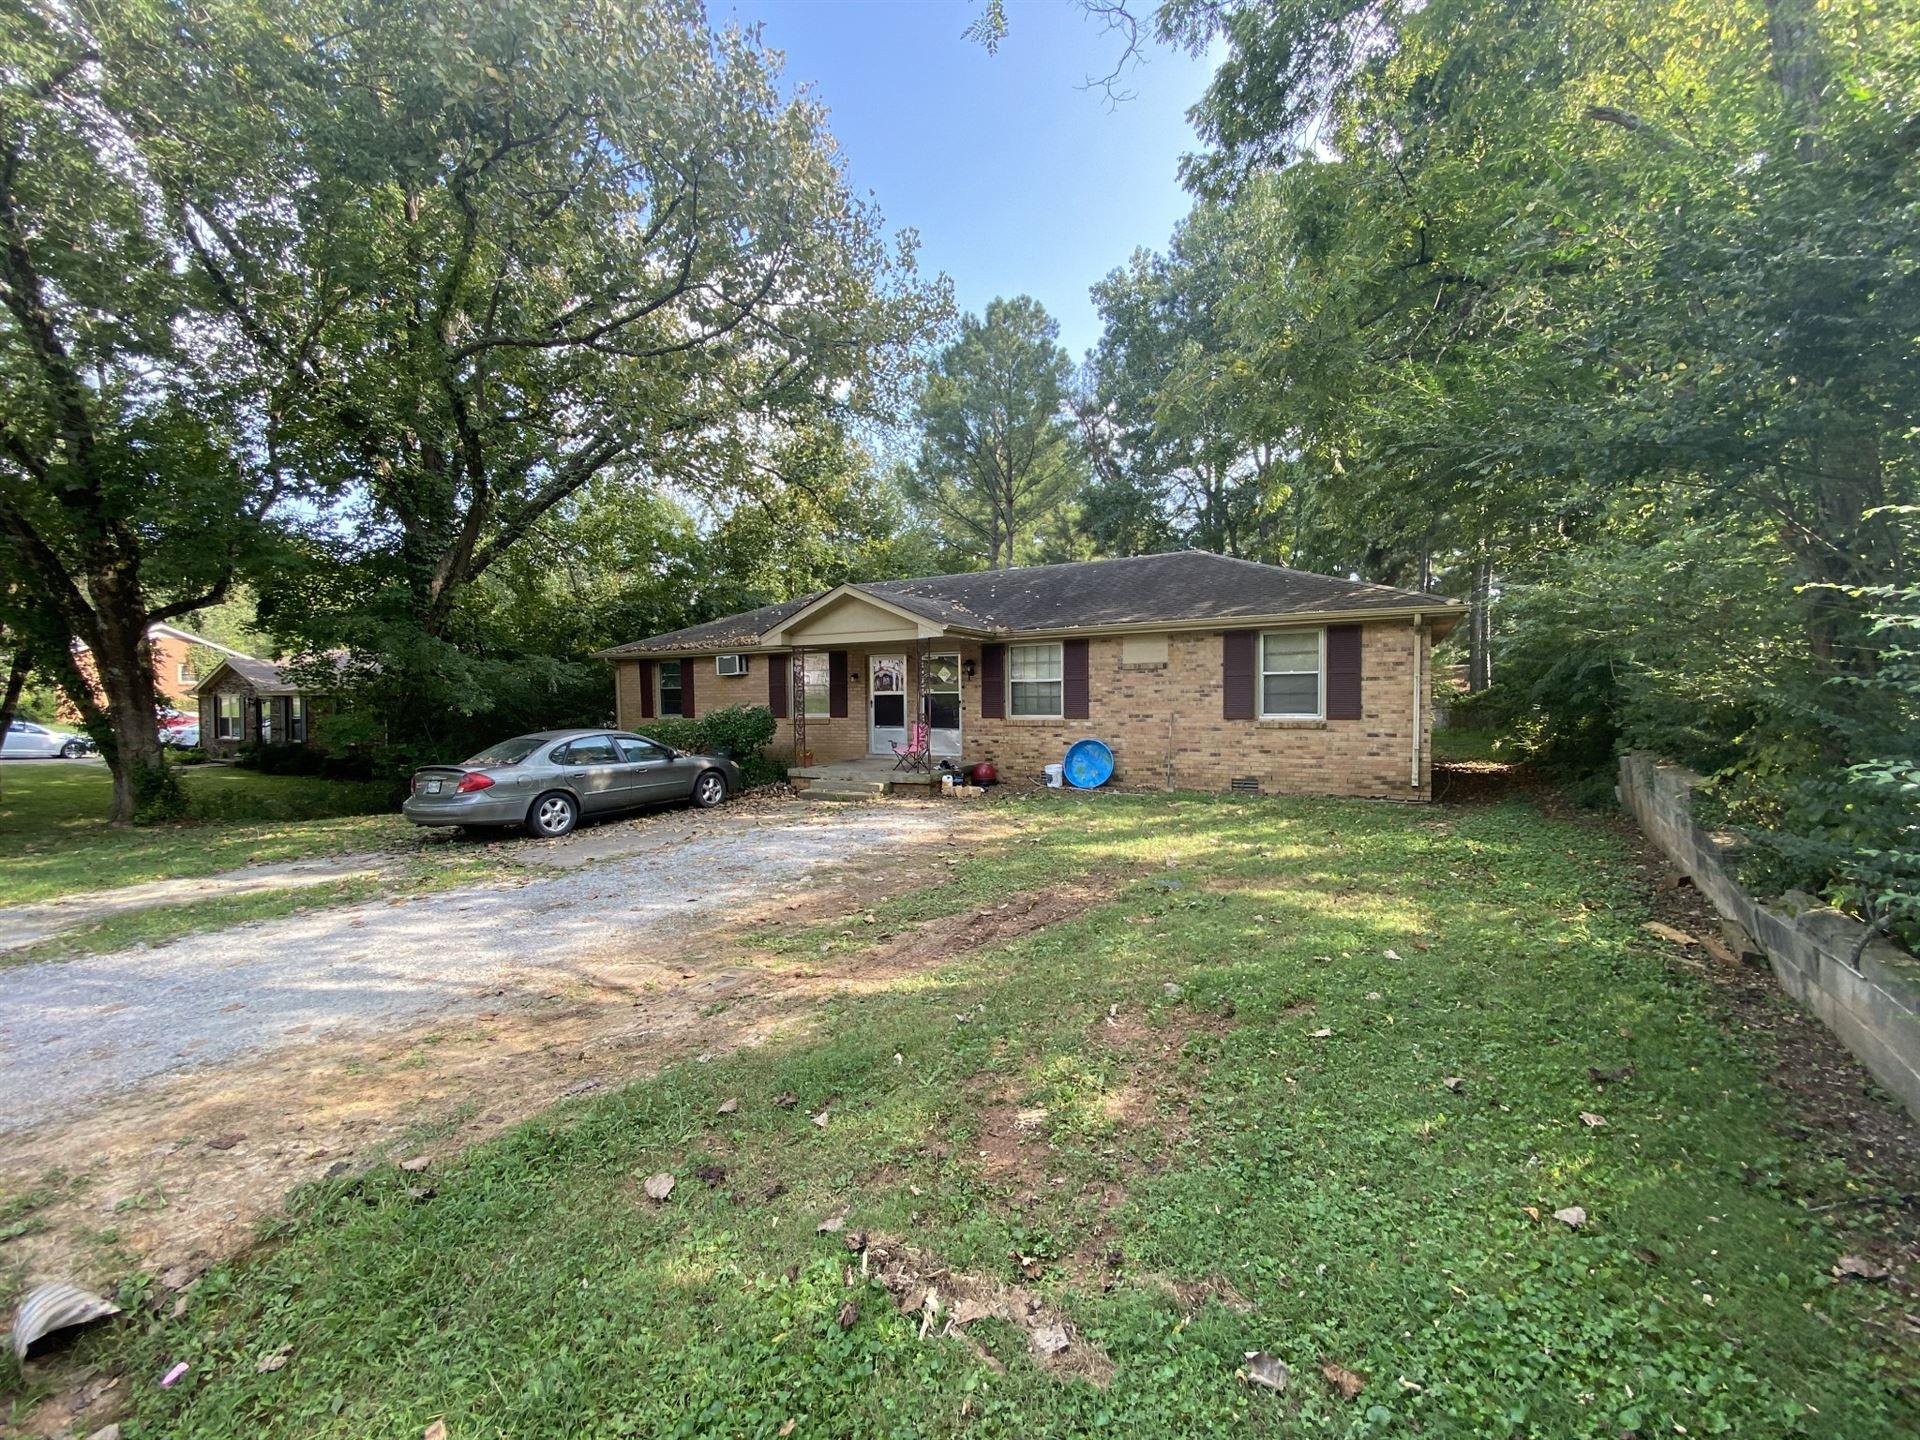 1670 Robin Pl, Clarksville, TN 37043 - MLS#: 2189842